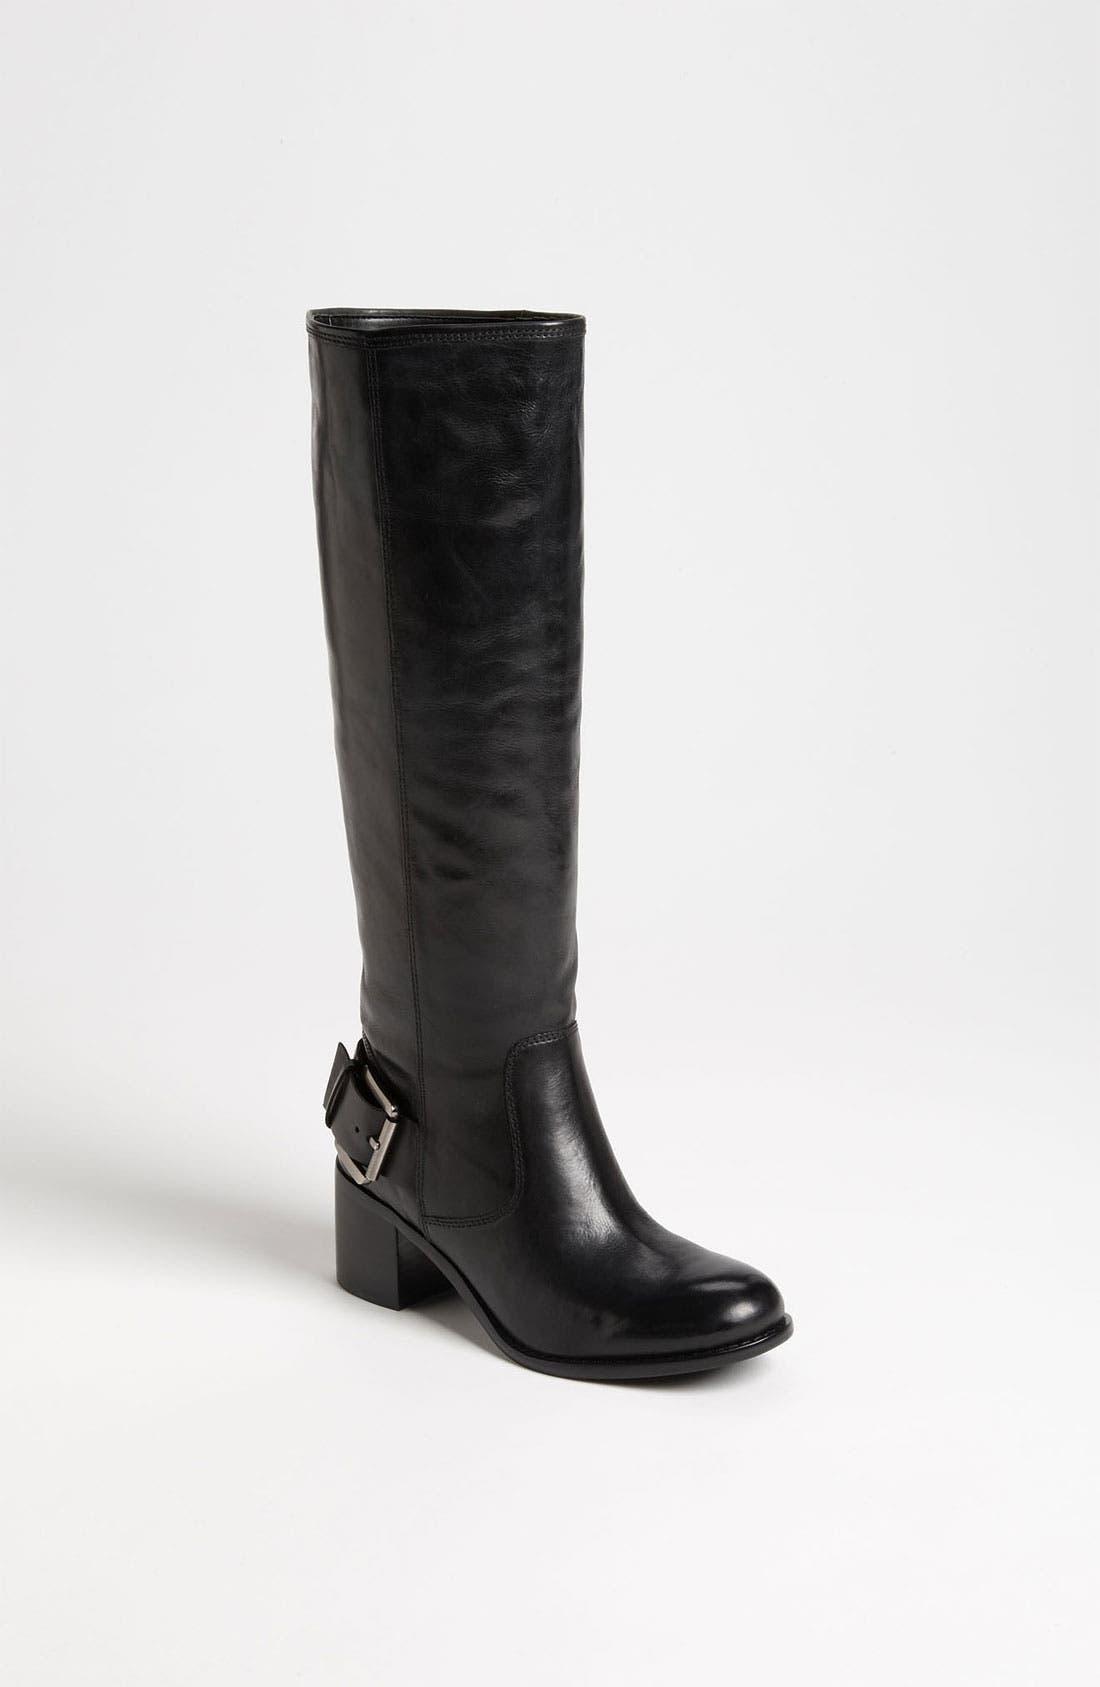 Alternate Image 1 Selected - Boutique 9 'Biondello' Boot